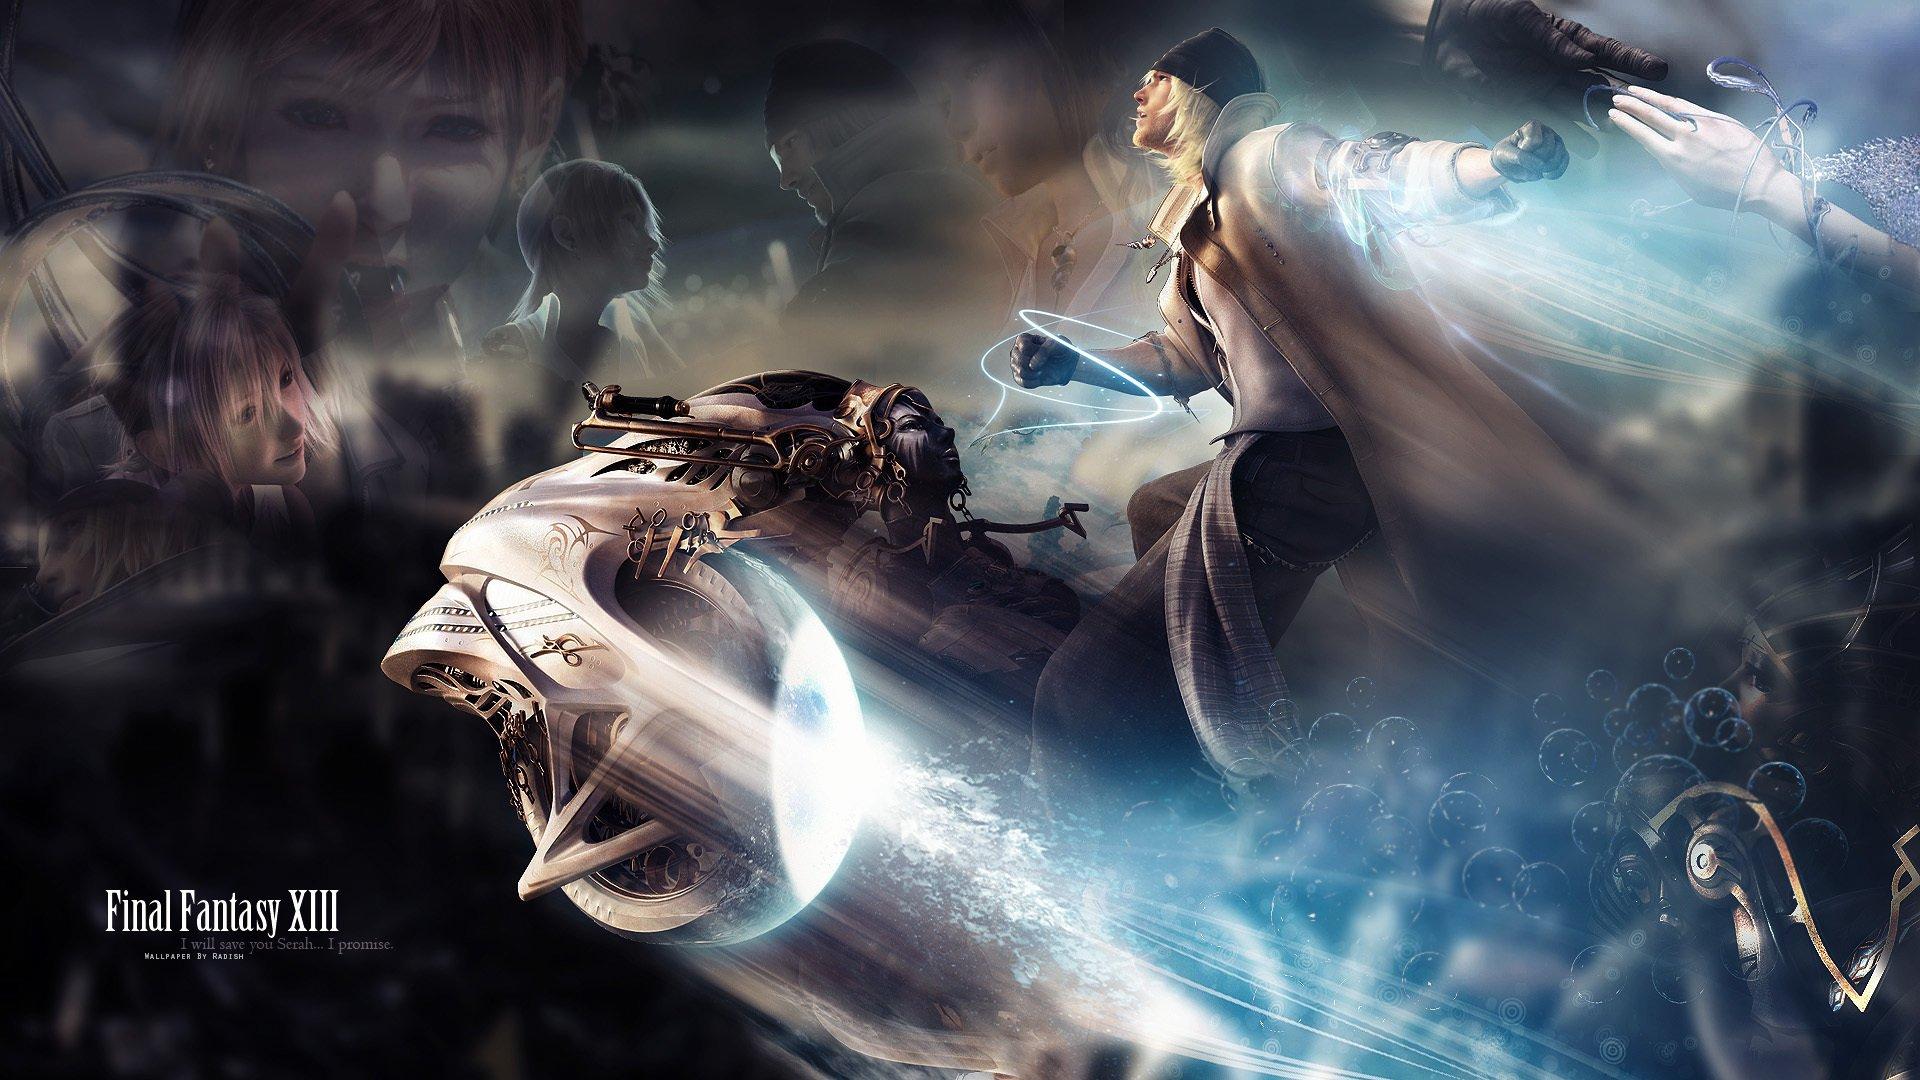 Final fantasy xiii hd wallpaper background image - Final fantasy 10 wallpaper 1920x1080 ...